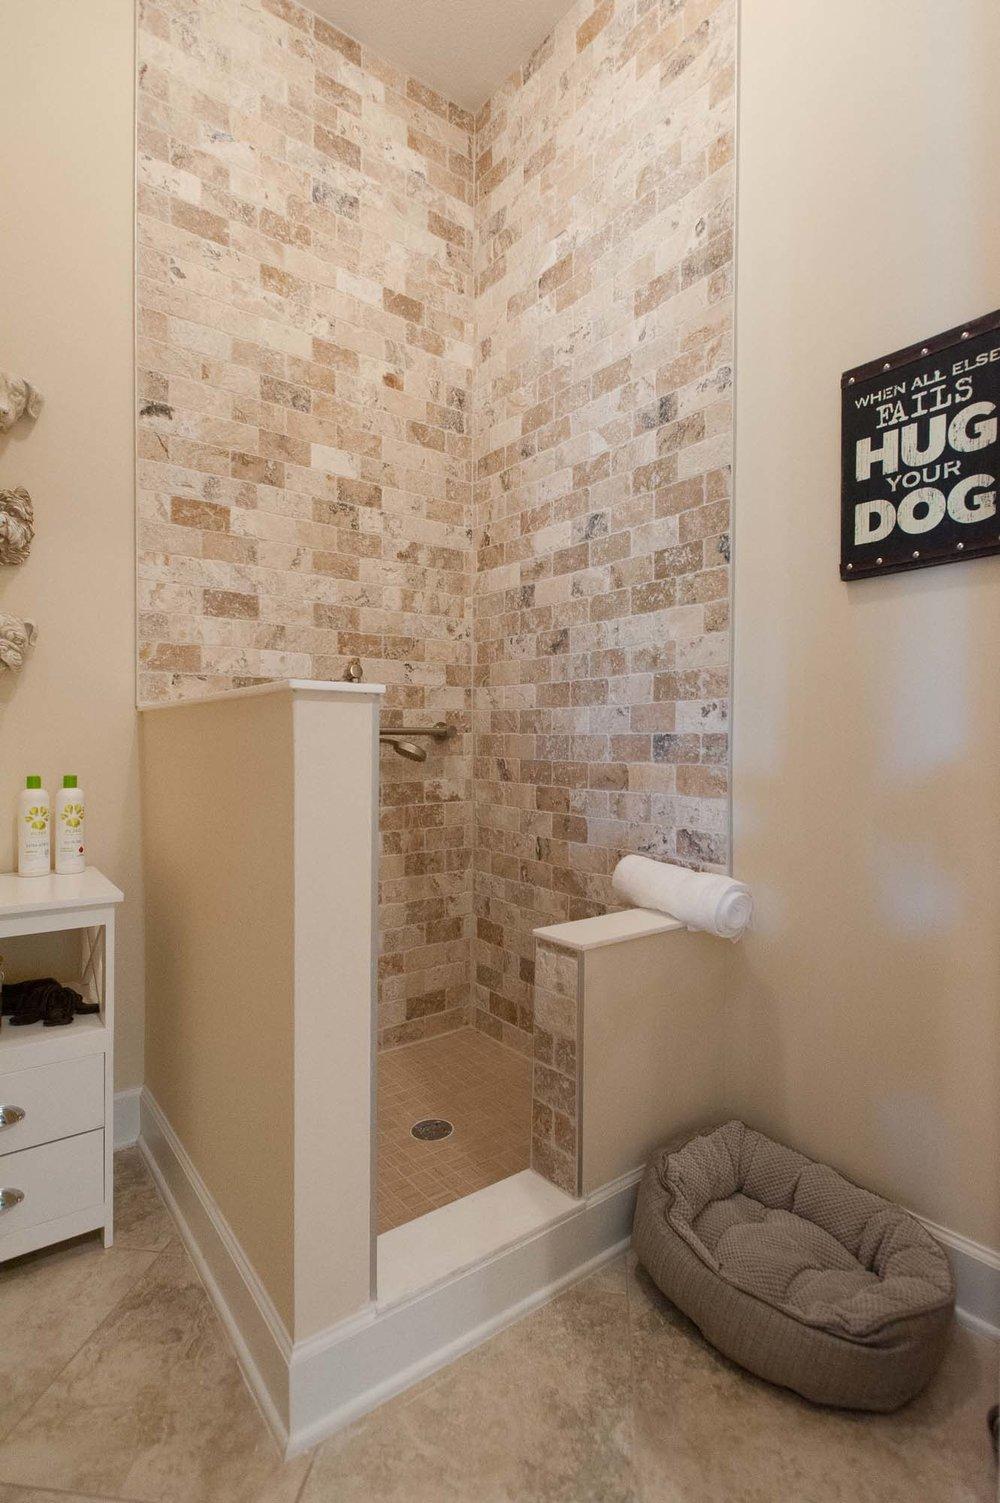 sterling-lennar-celestina-st johns-florida-nefba-northeast florida-southeastern united states-residential interior design-contemporary-puppy-wash-puppy wash-mud-room-mudroom-powder room-.jpg